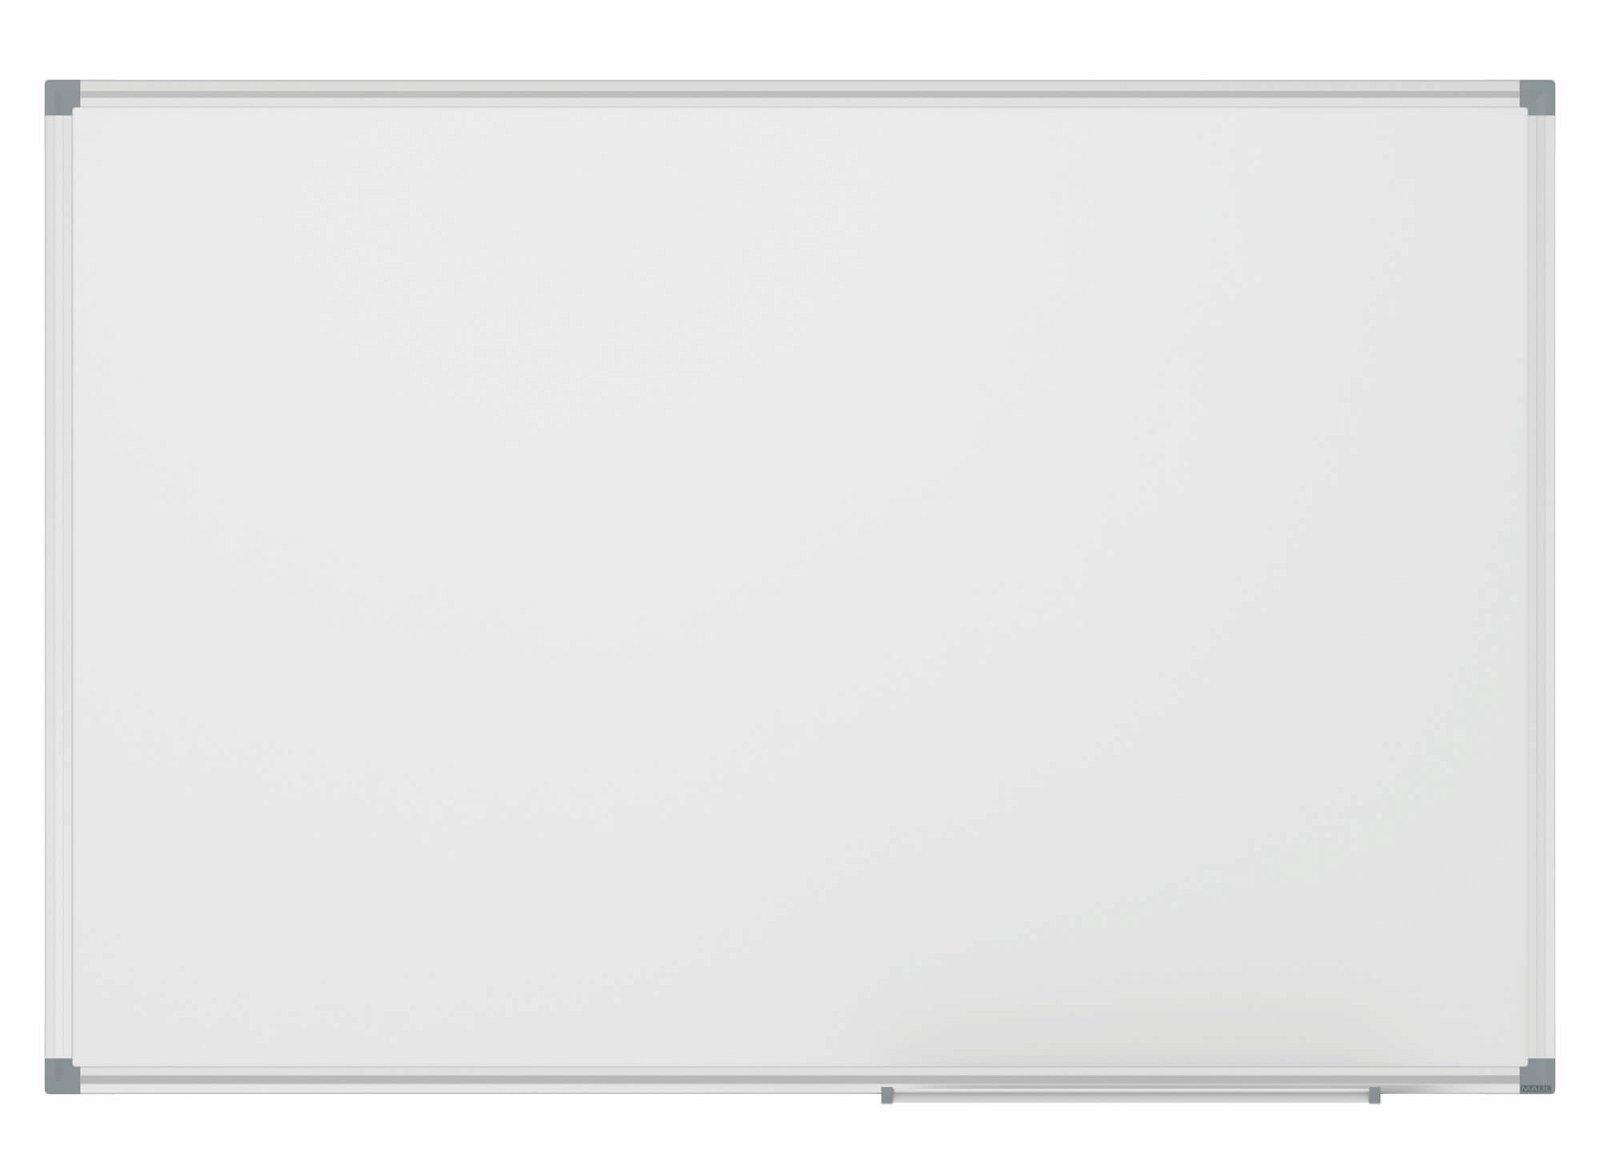 Whiteboard MAULstandard, 60x90 cm, grau